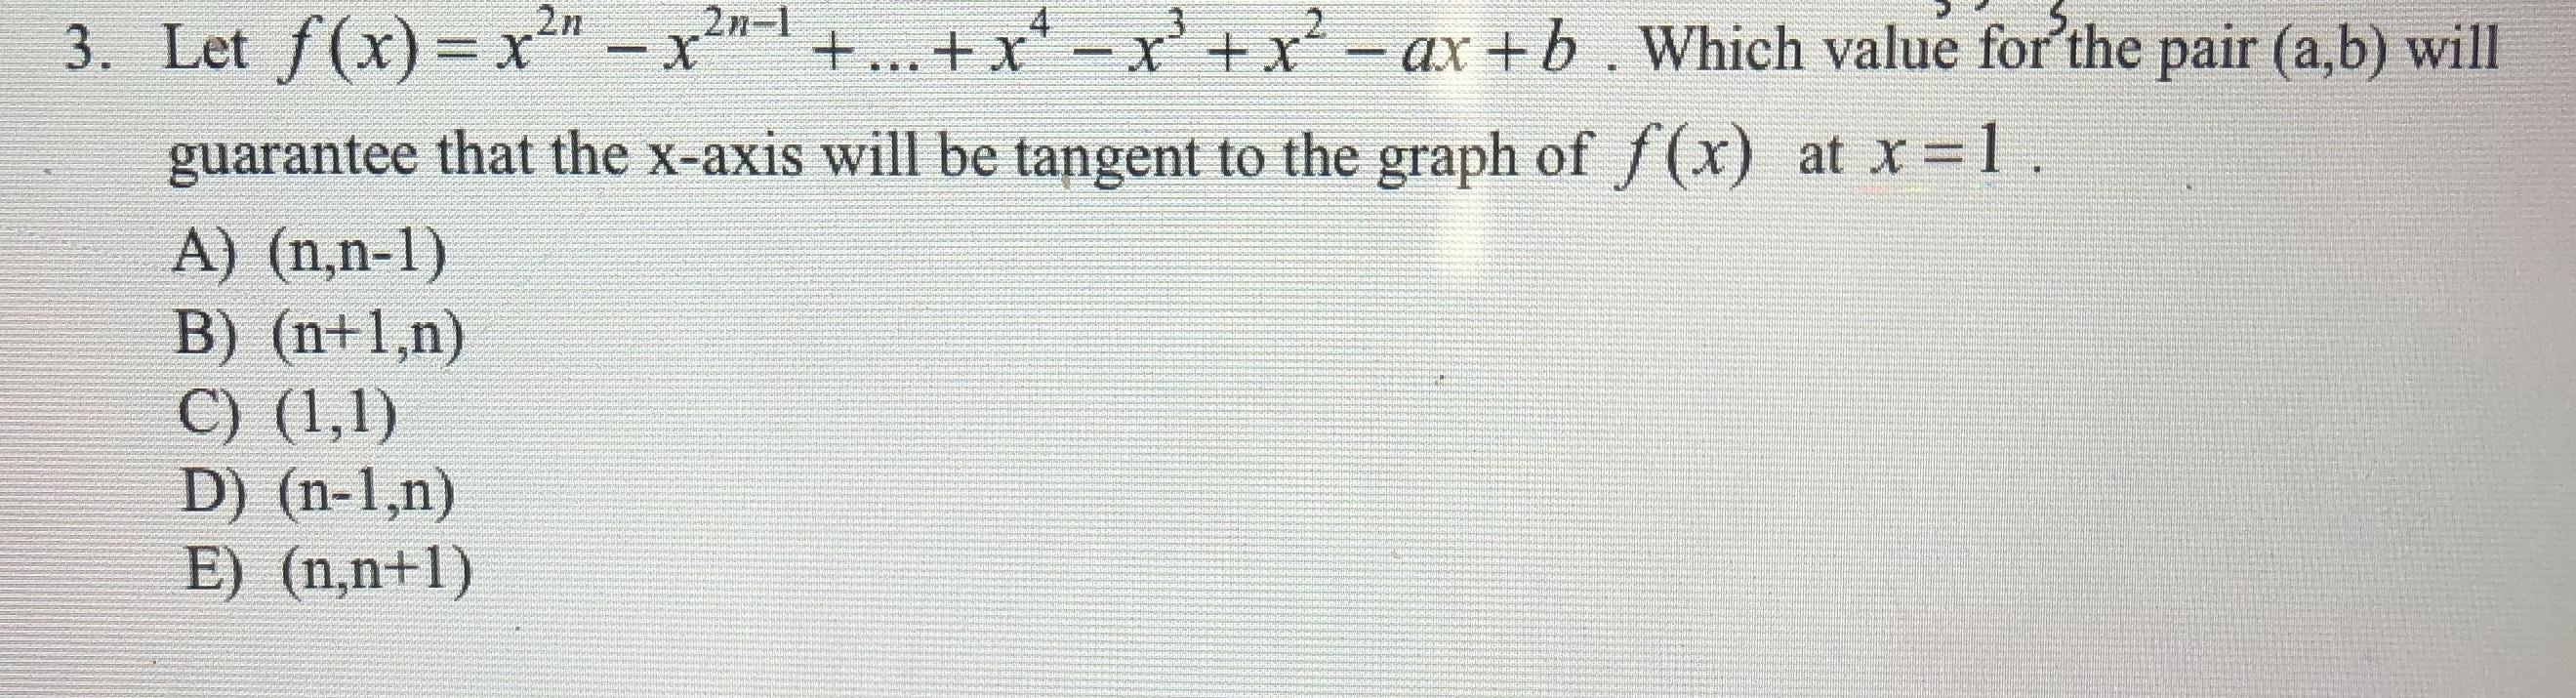 2n- X 2n 3. Let f(x)- x-x +... + xxx-ax+b. Which value for'the pair (a,b) will X guarantee that the x-axis will be tangent to the graph of /(x) at x 1 A) (n,n-1) B) (n+1,n) C) (1,1) D) (n-1,n) E) (n,n+1)